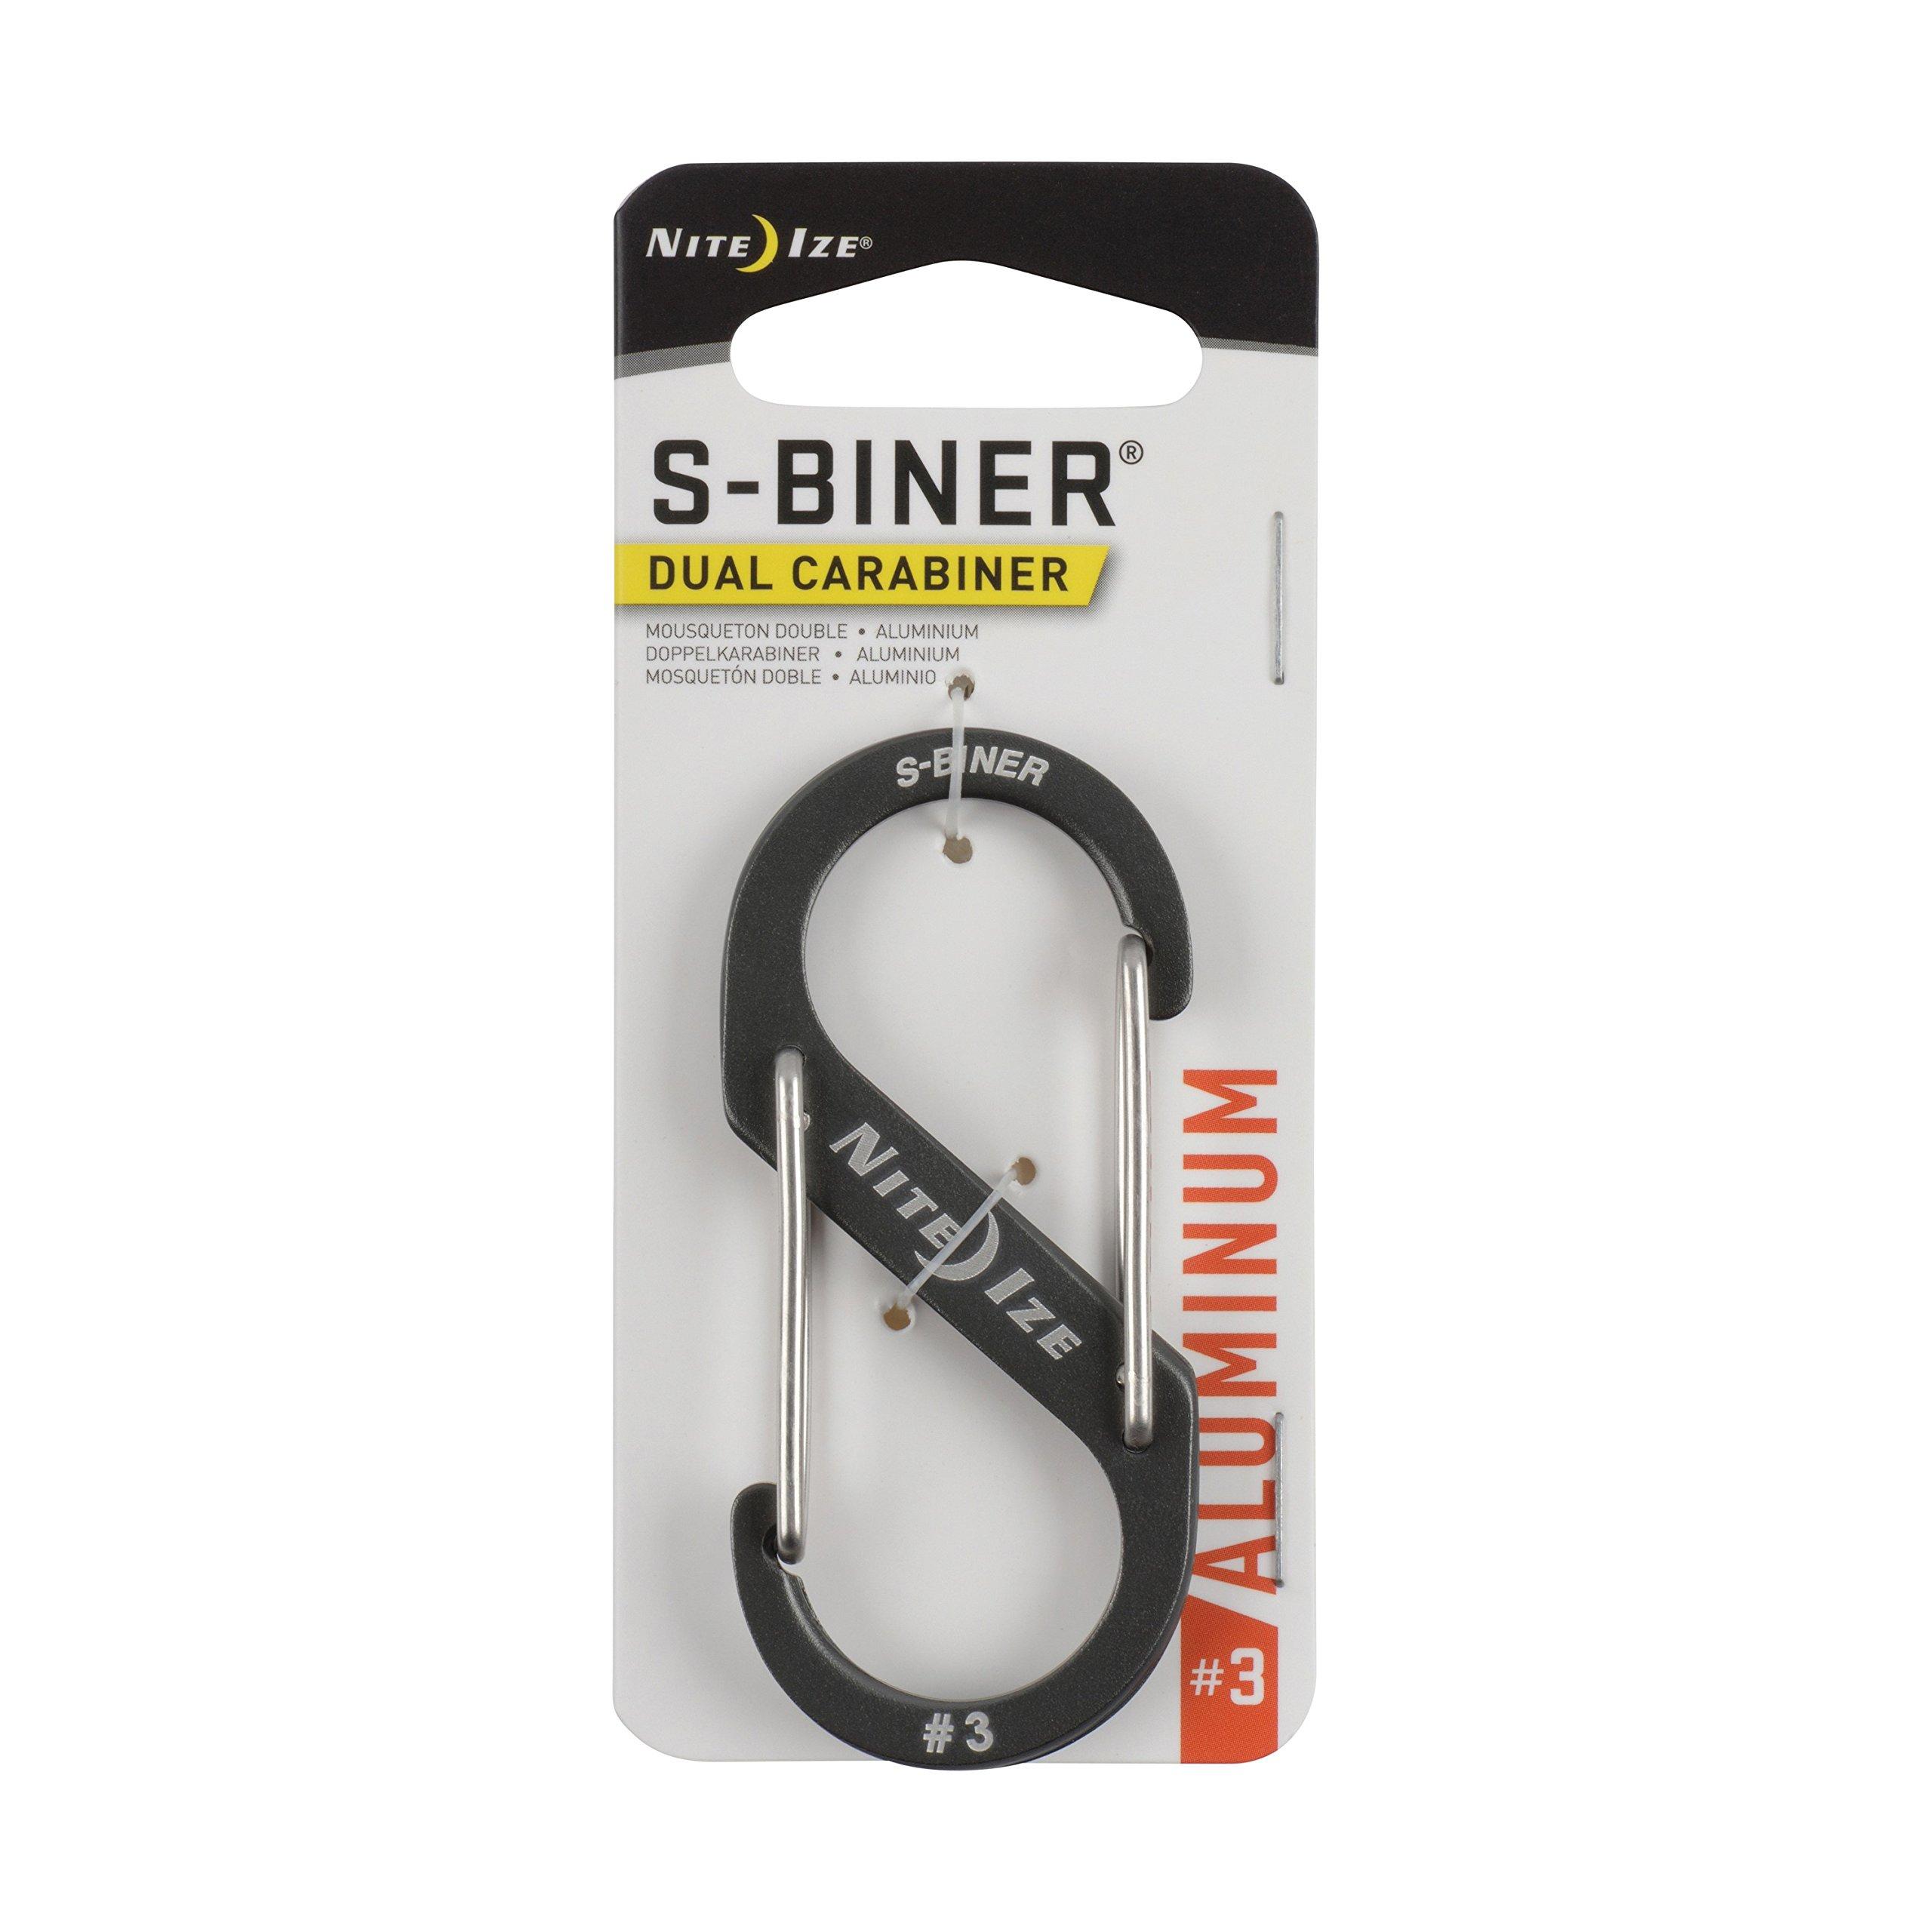 Nite Ize Size-3 S-Biner Dual